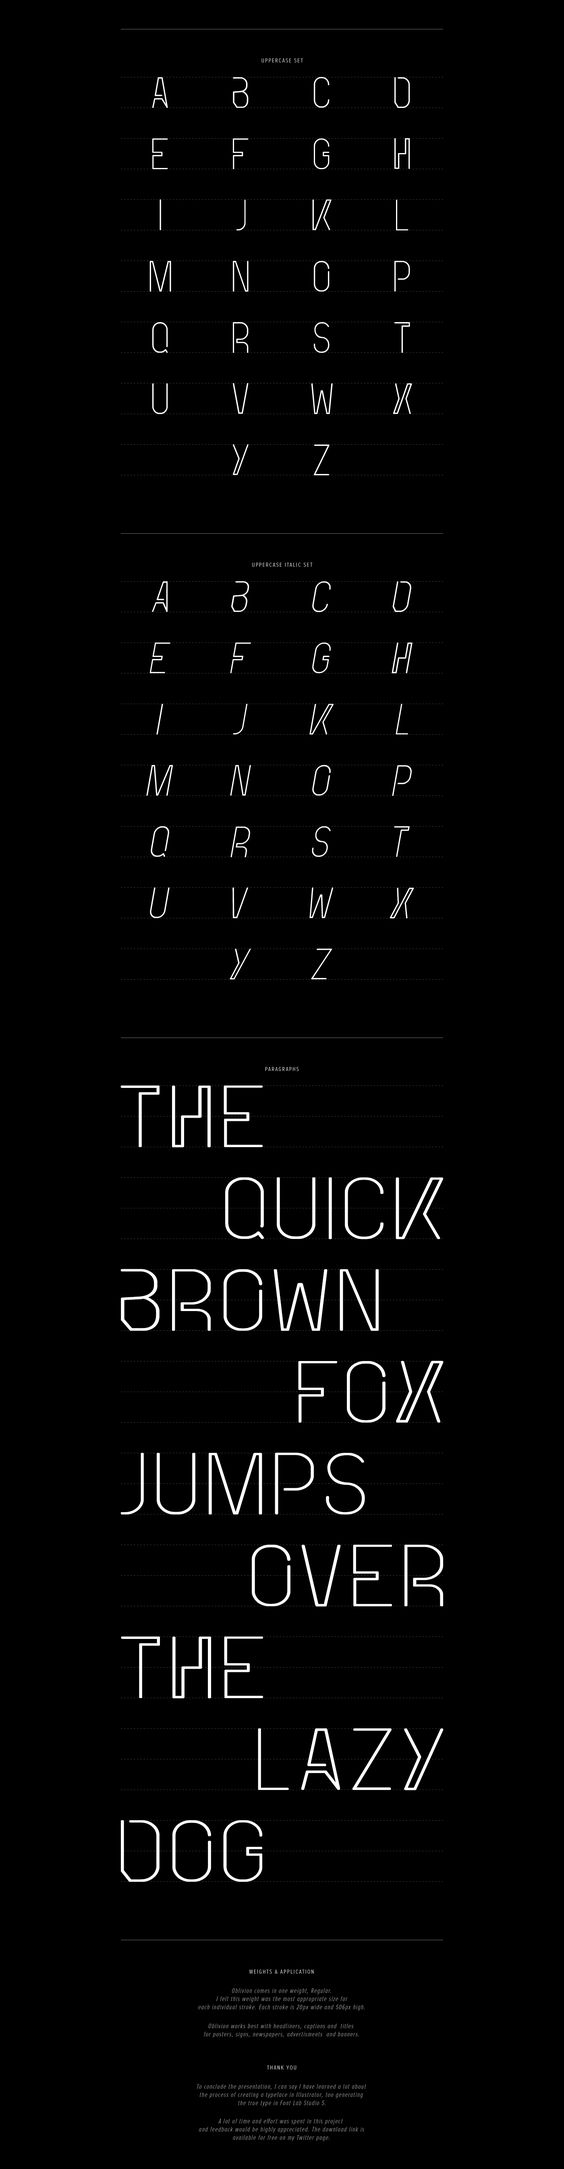 typographies gratuites cv